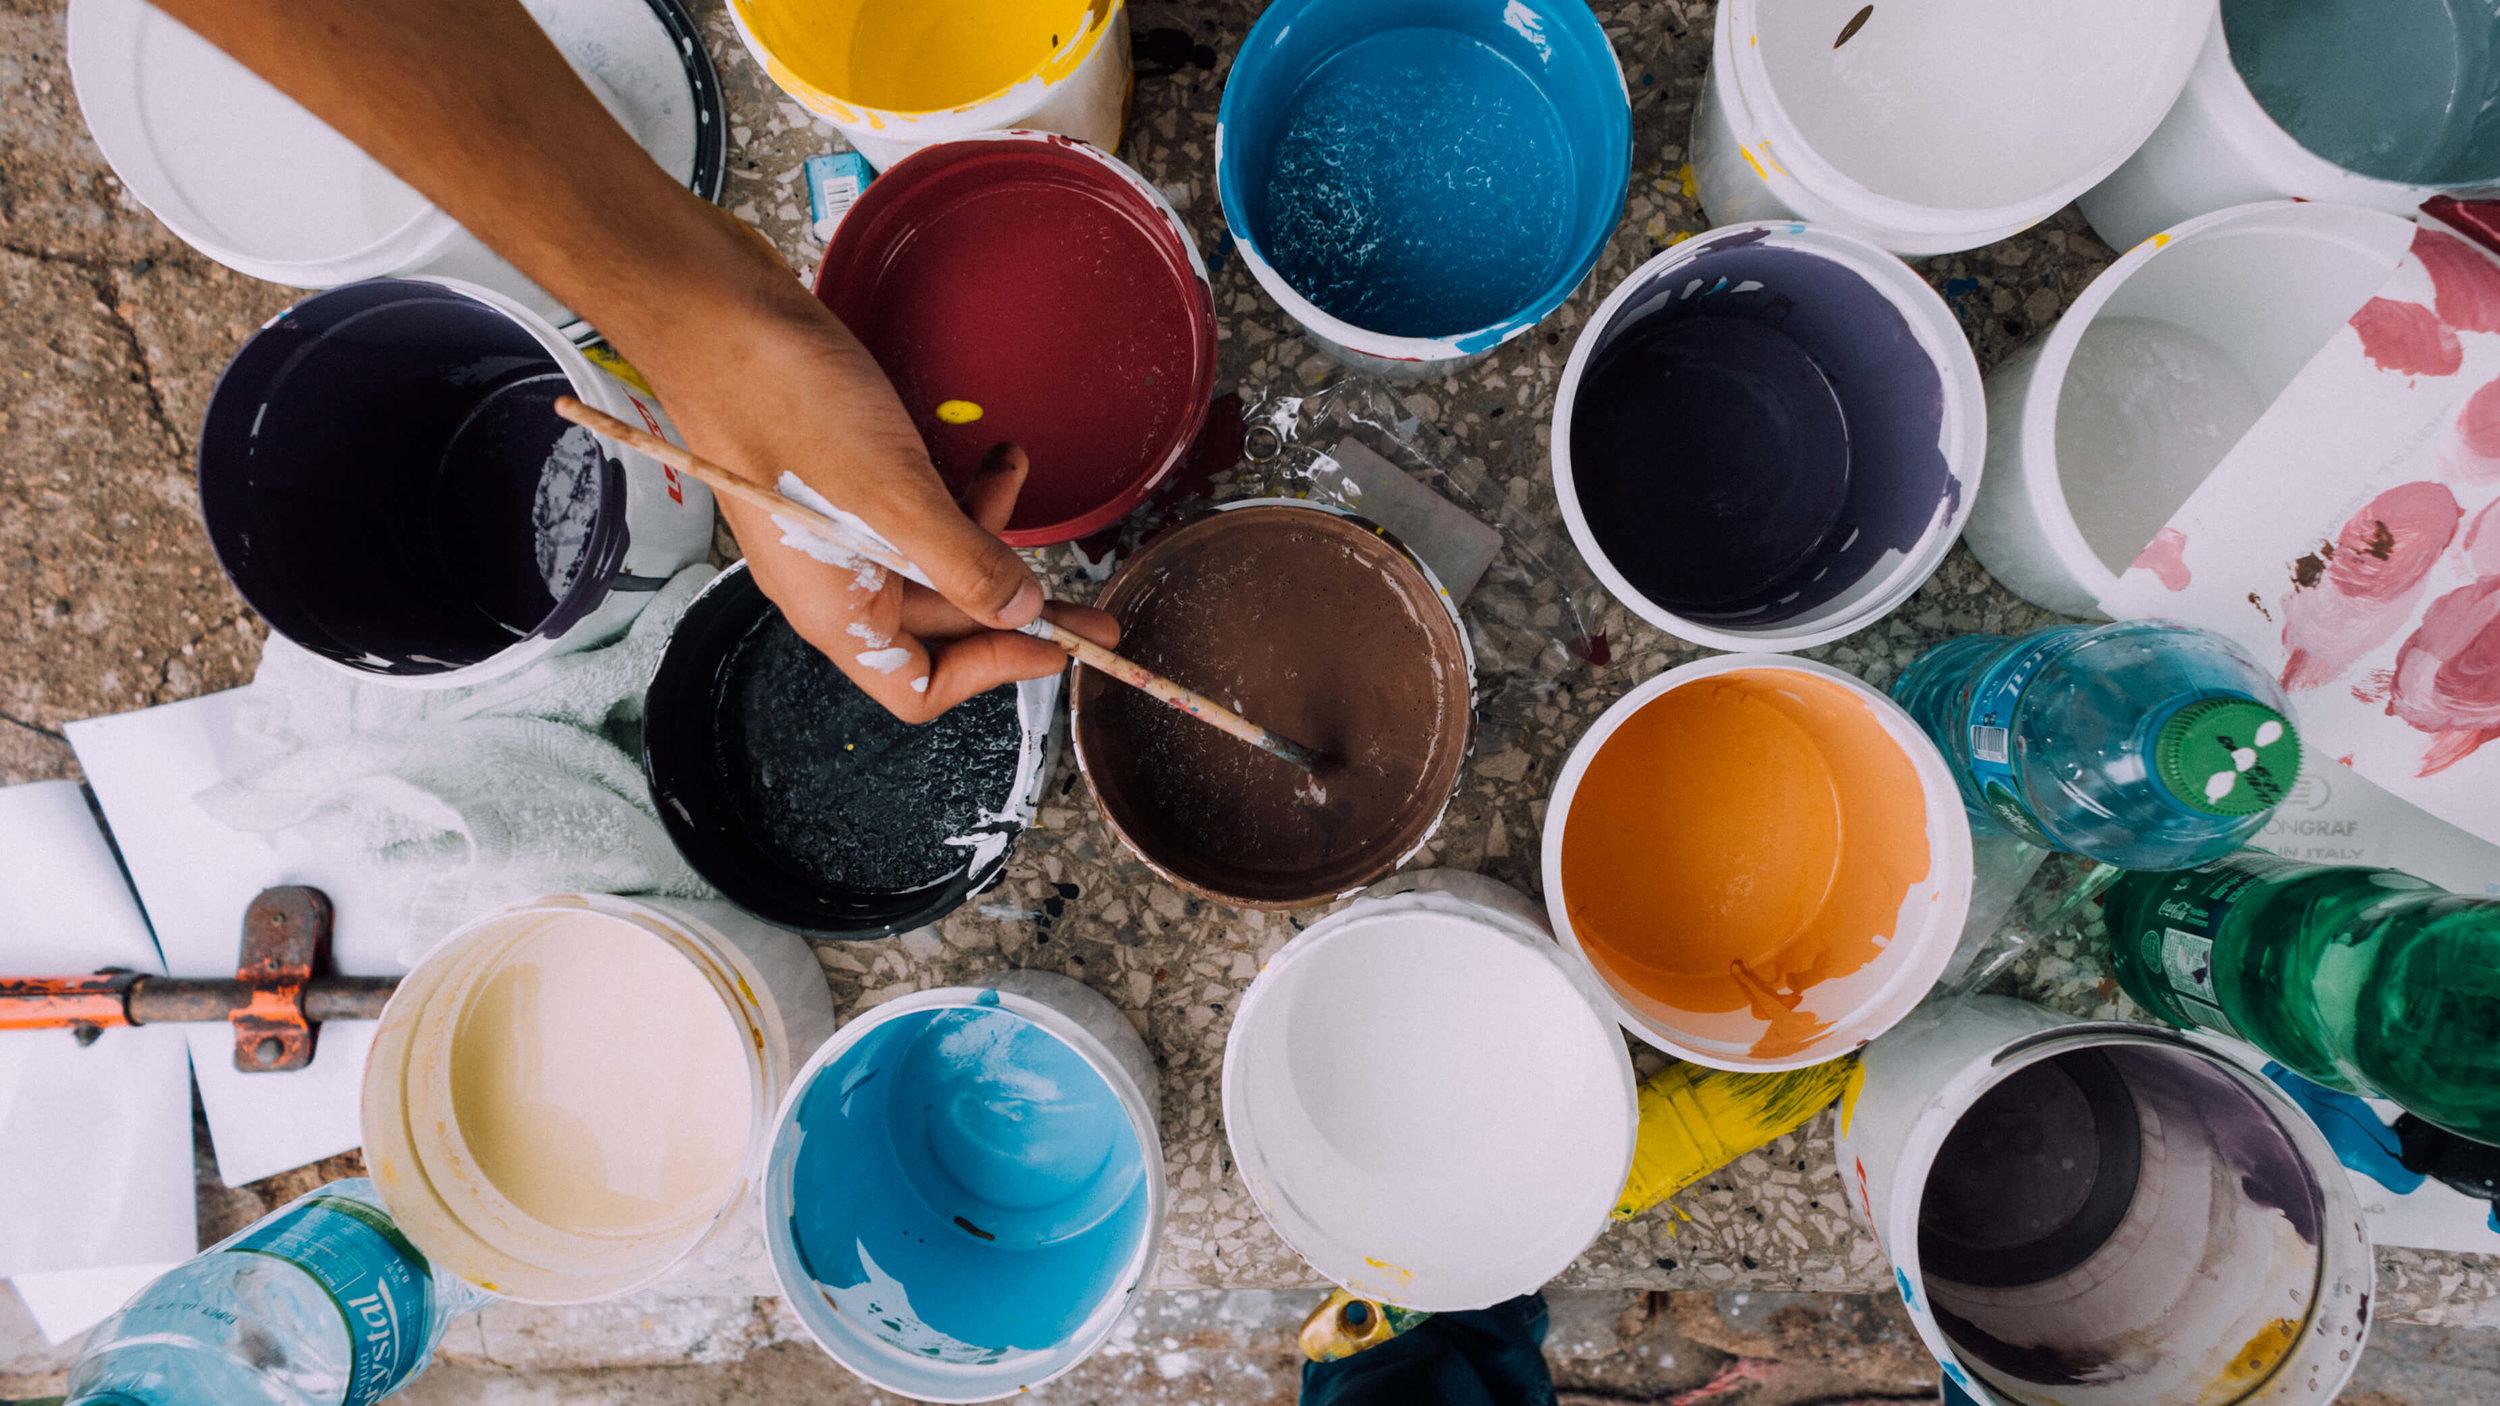 Paint & Sip Group